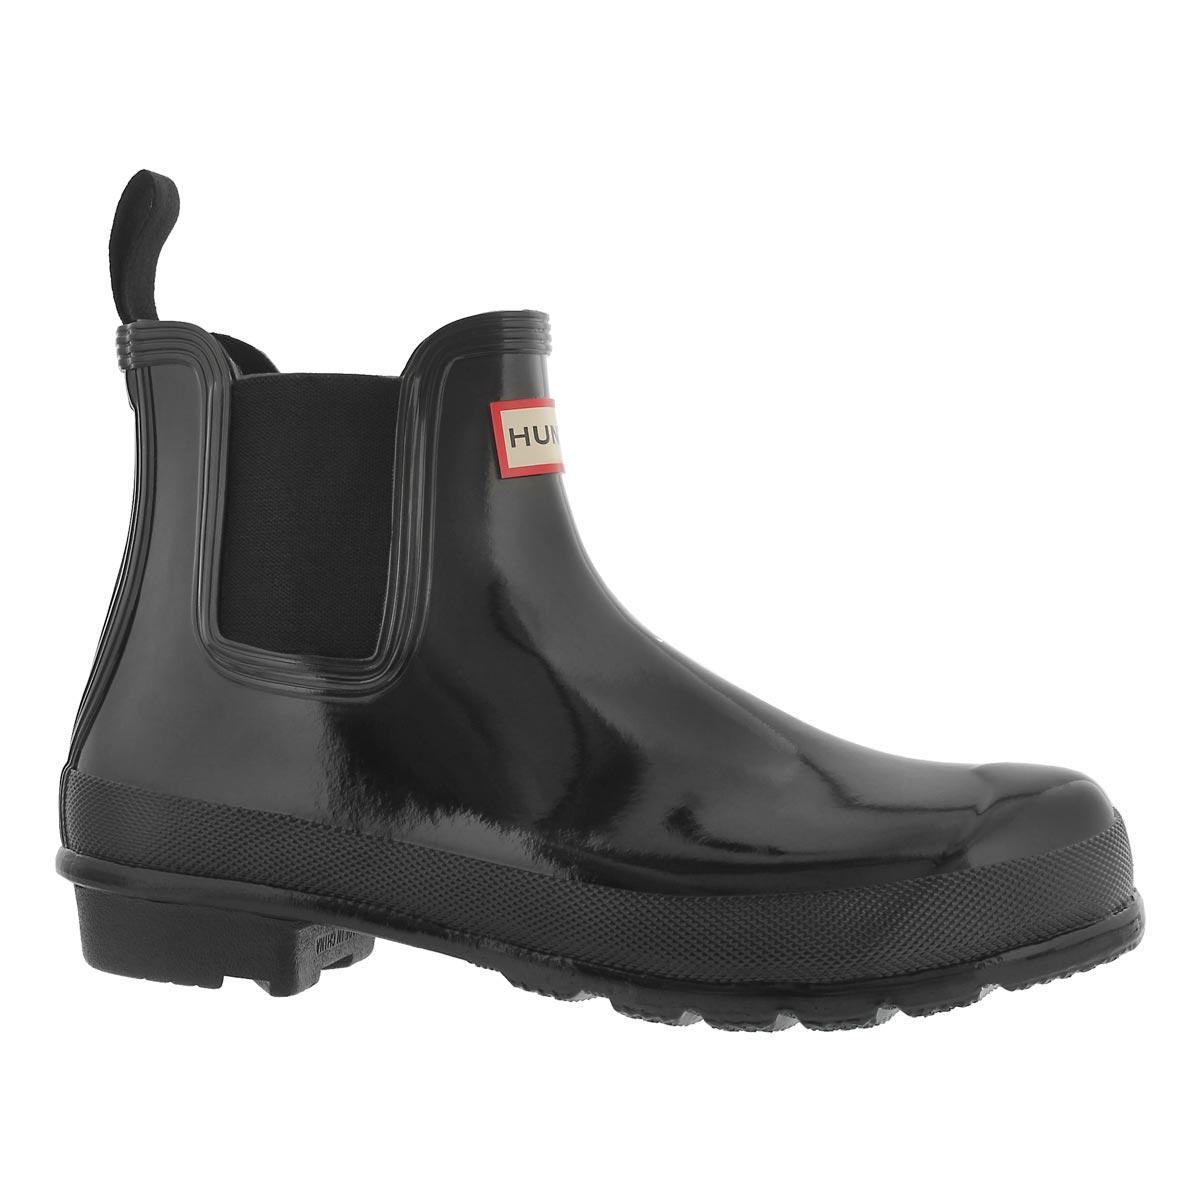 Women's ORIGINAL CHELSEA gloss black rain boots